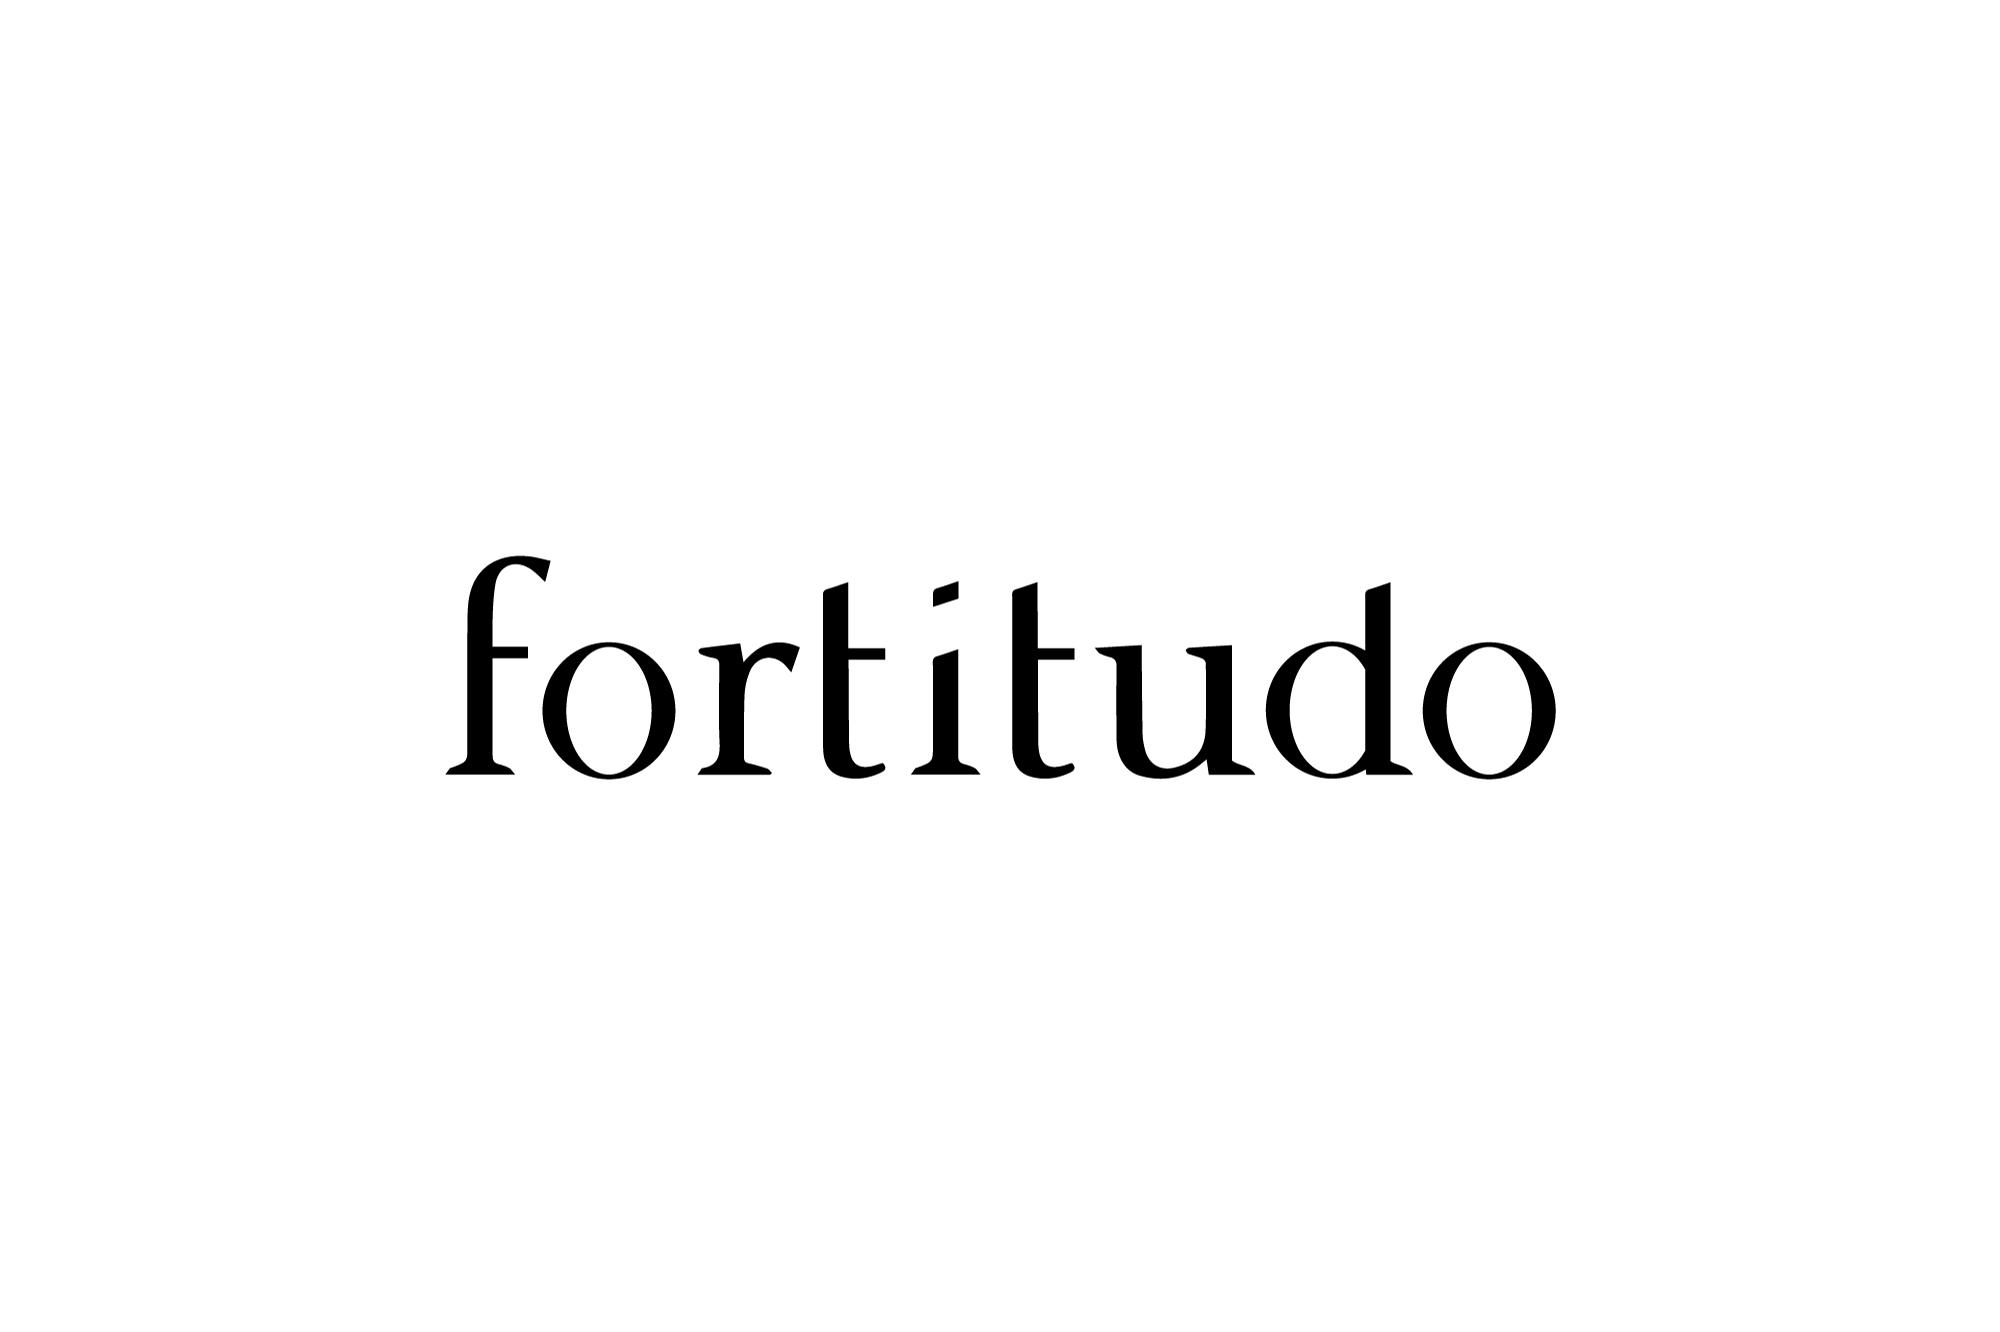 Fortitudo property logo